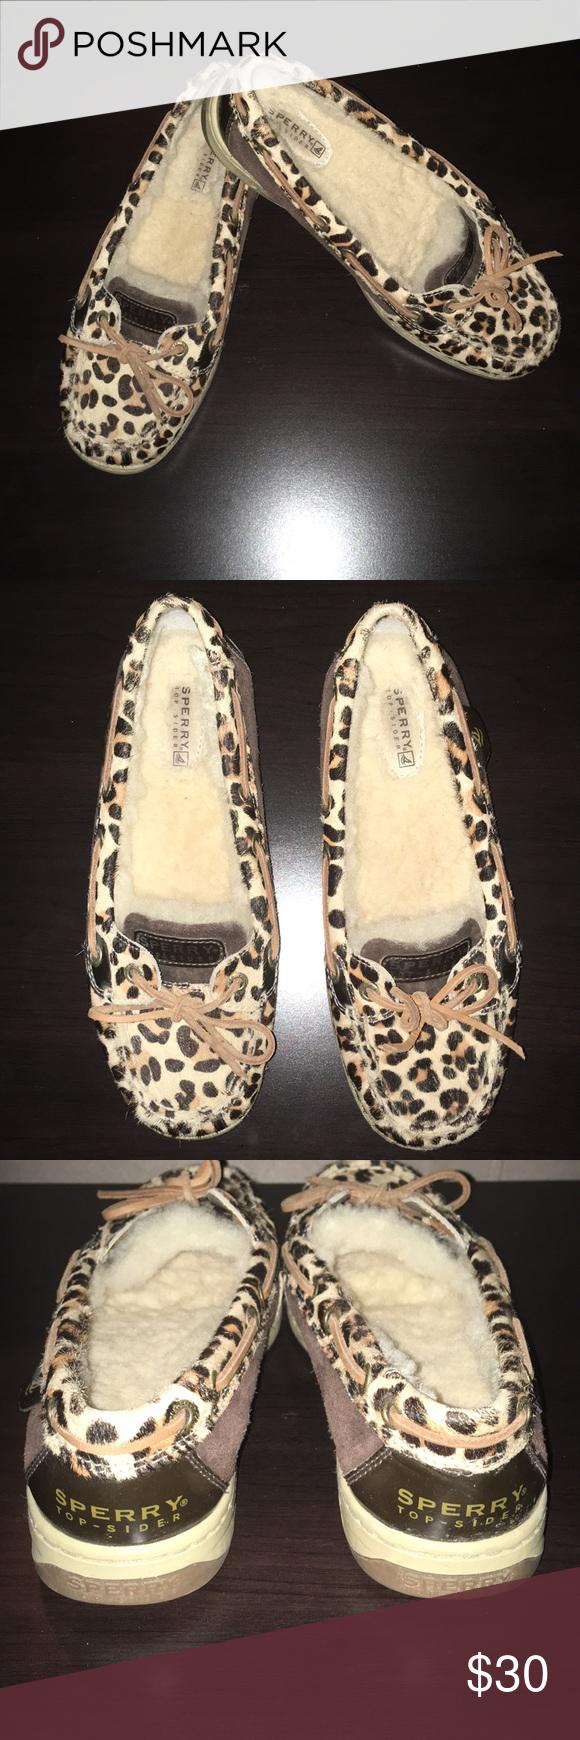 77f94e7827b Sperry Topsider Leopard print Leopard print Sperry Topsider. Fleece lining.  Size 6.5. Sperry Shoes Flats   Loafers